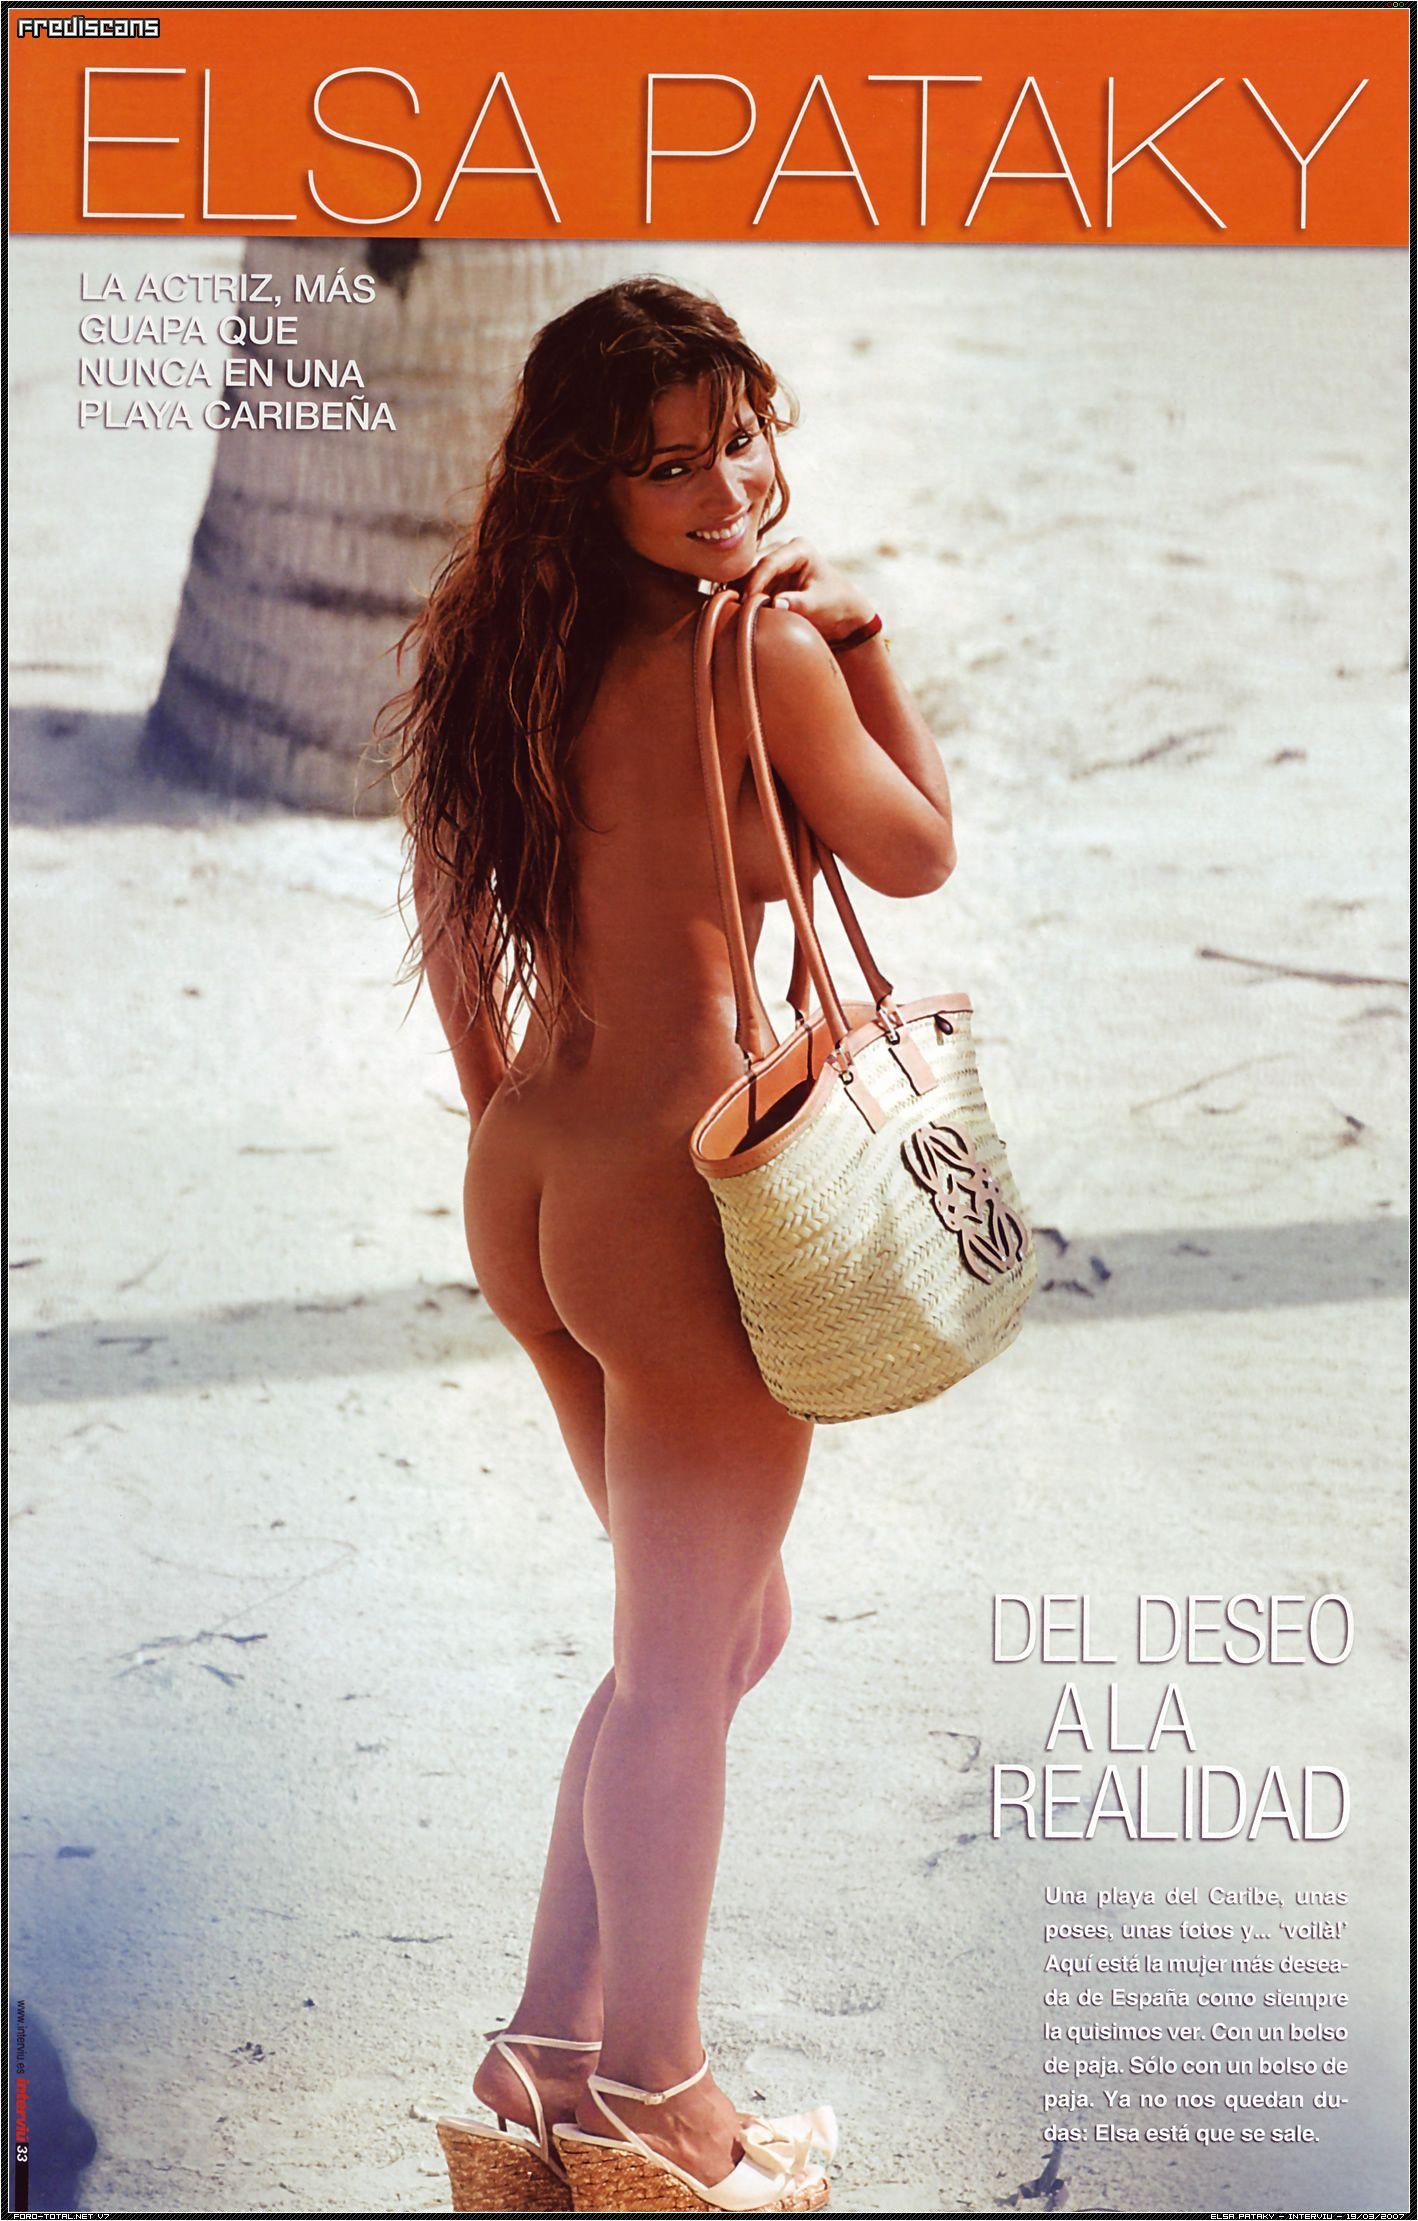 Condenan A Interviú Por El Desnudo Robado A Elsa Pataky Elsa